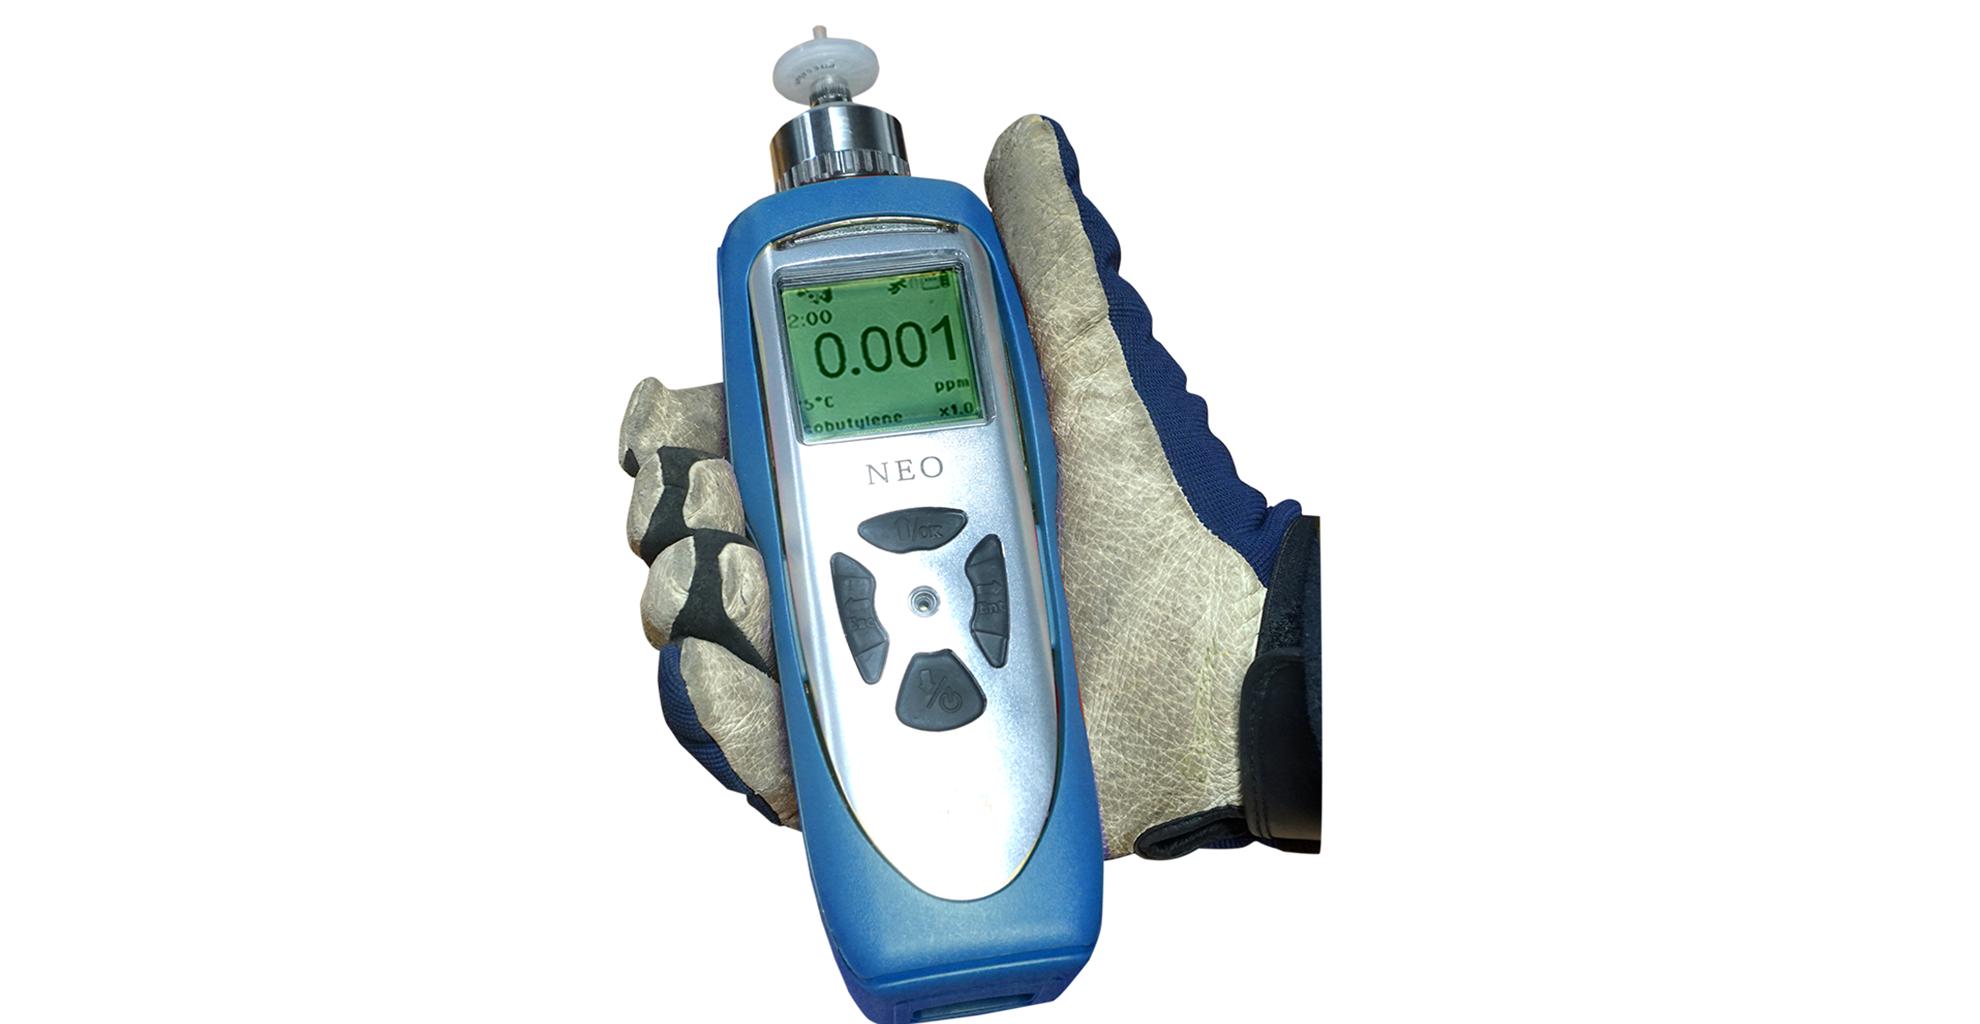 2portable 7solutions - Vast opgestelde gas detectie   Draagbare gas detectie   Lekdetectie en Draadloze gas detectie